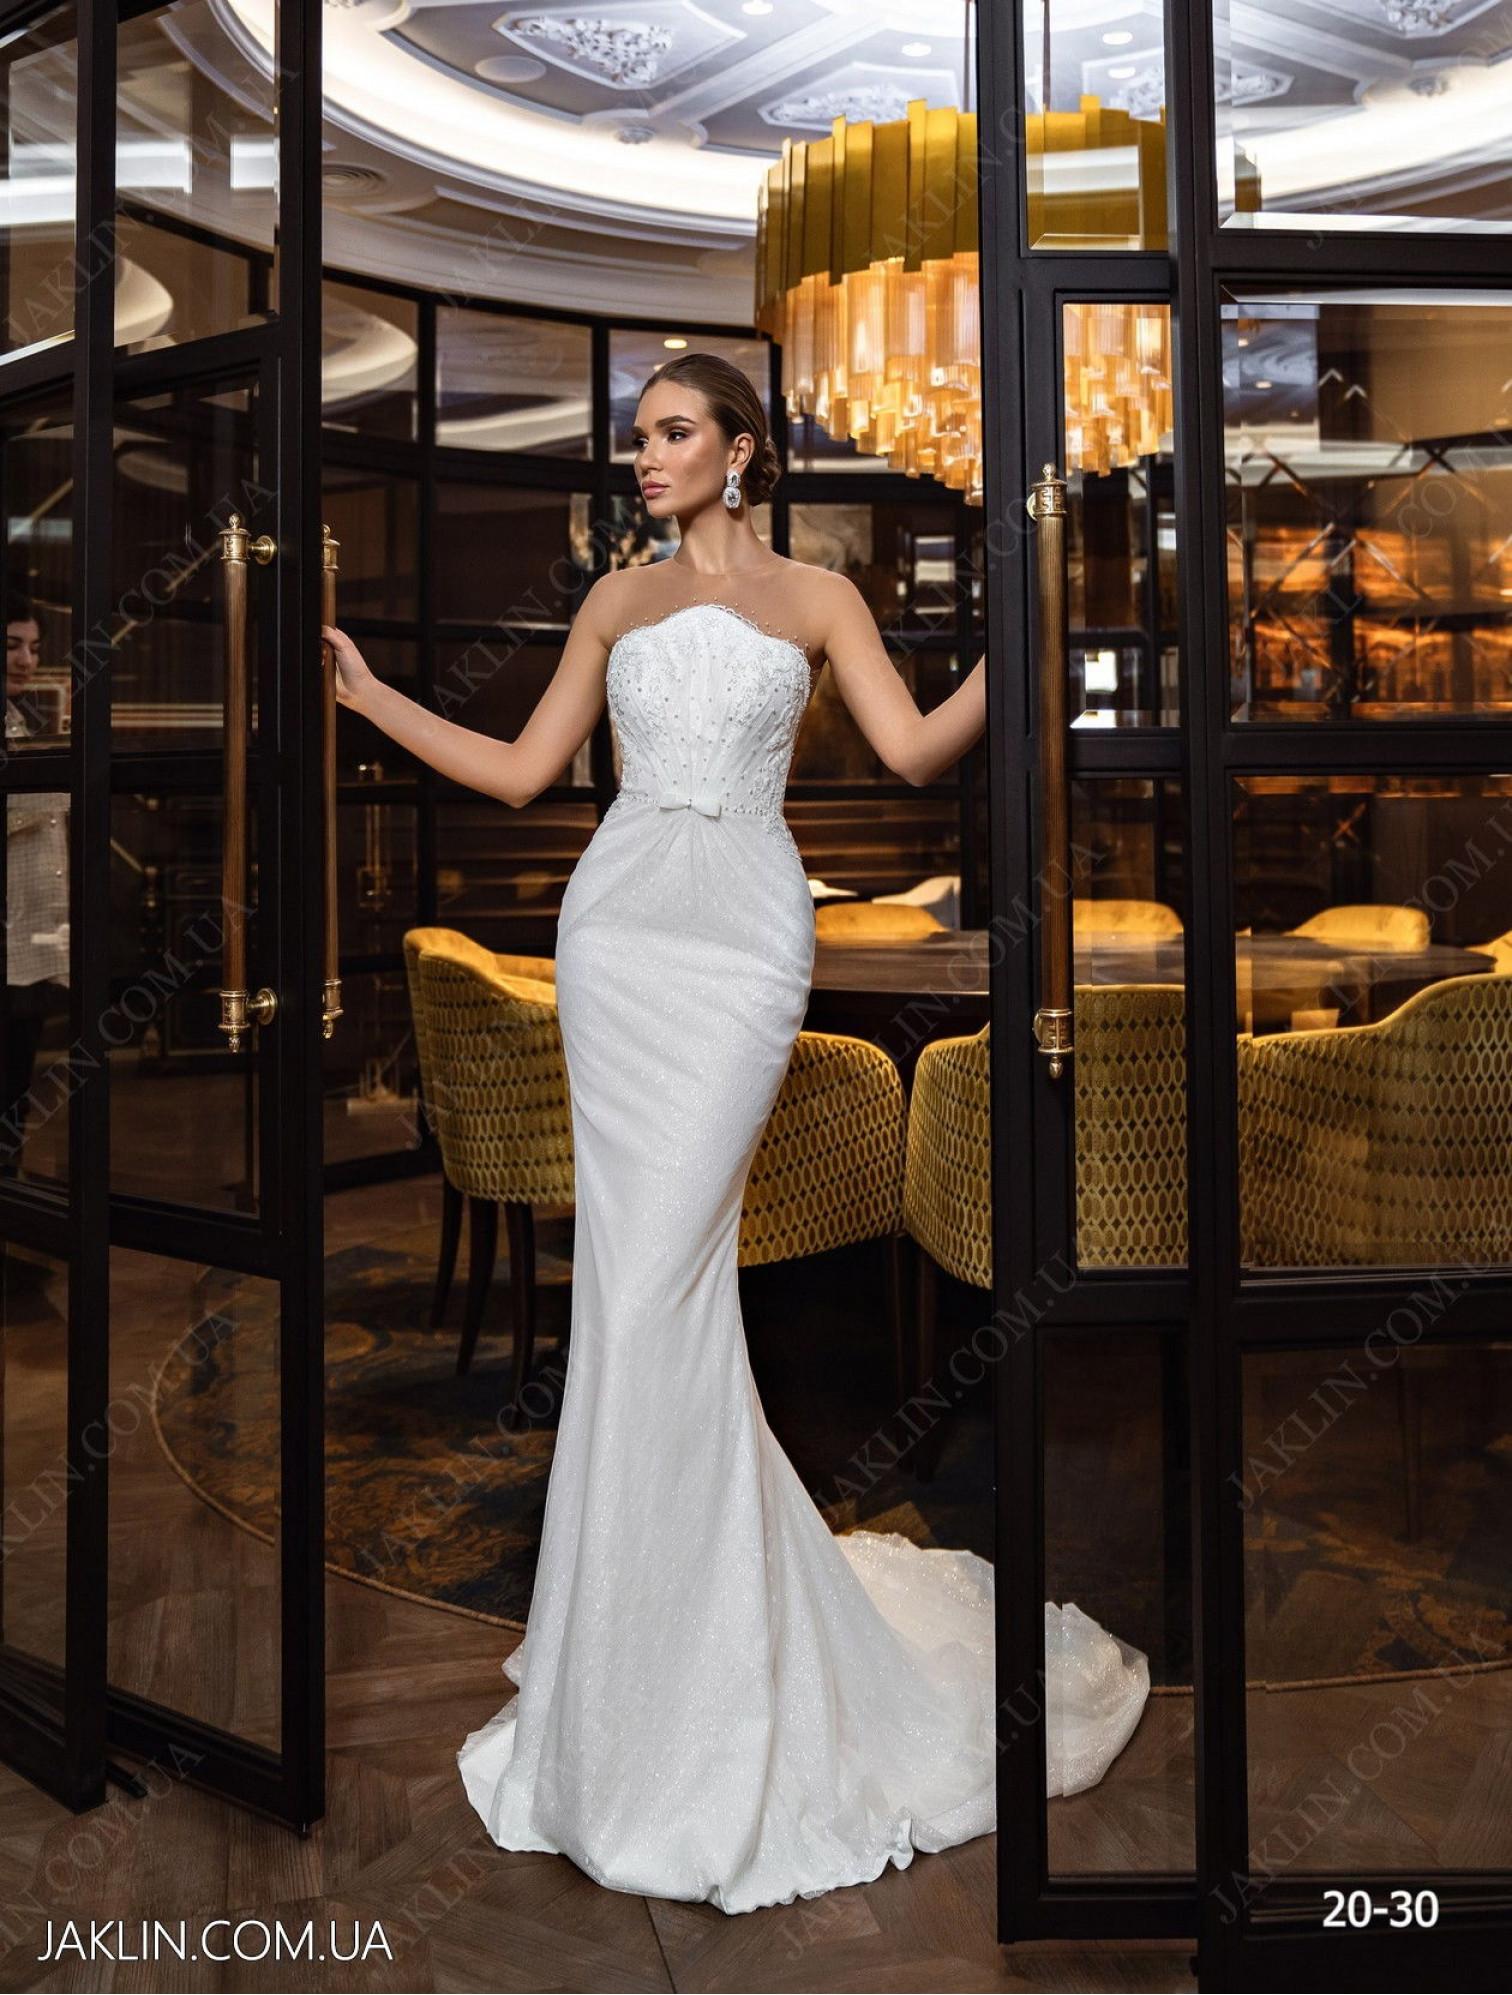 Wedding dress 20-30